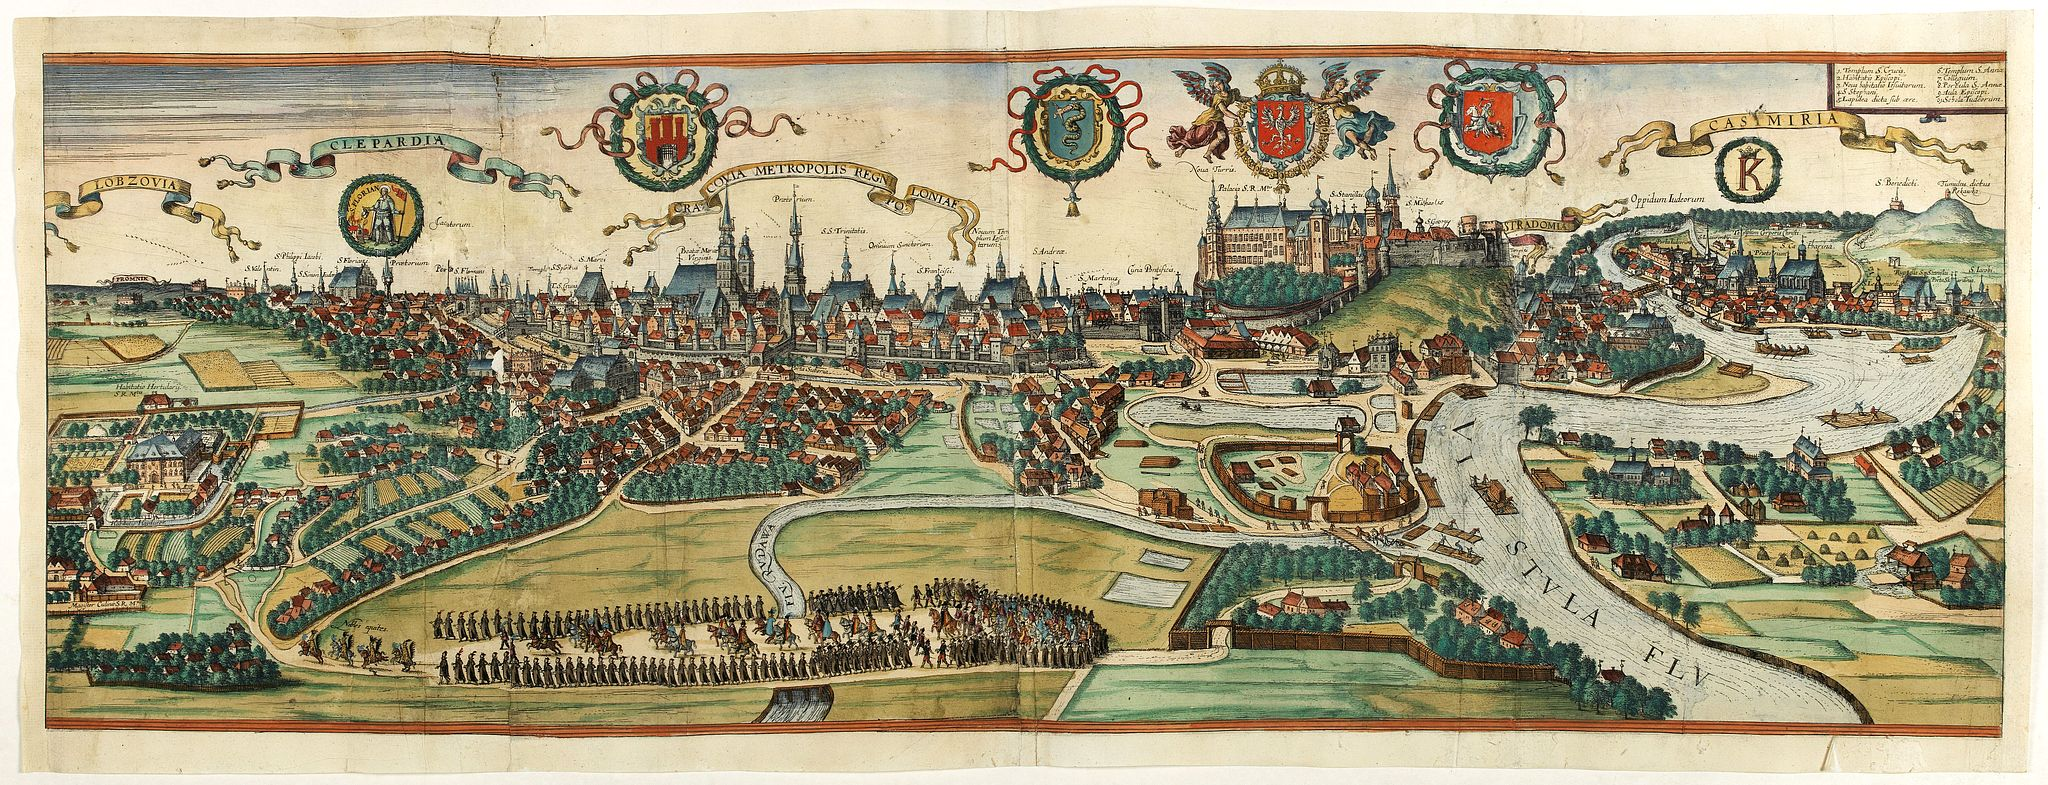 BRAUN, G. / HOGENBERG, F. -  Cracovia Metropolis Regni Poloniae.